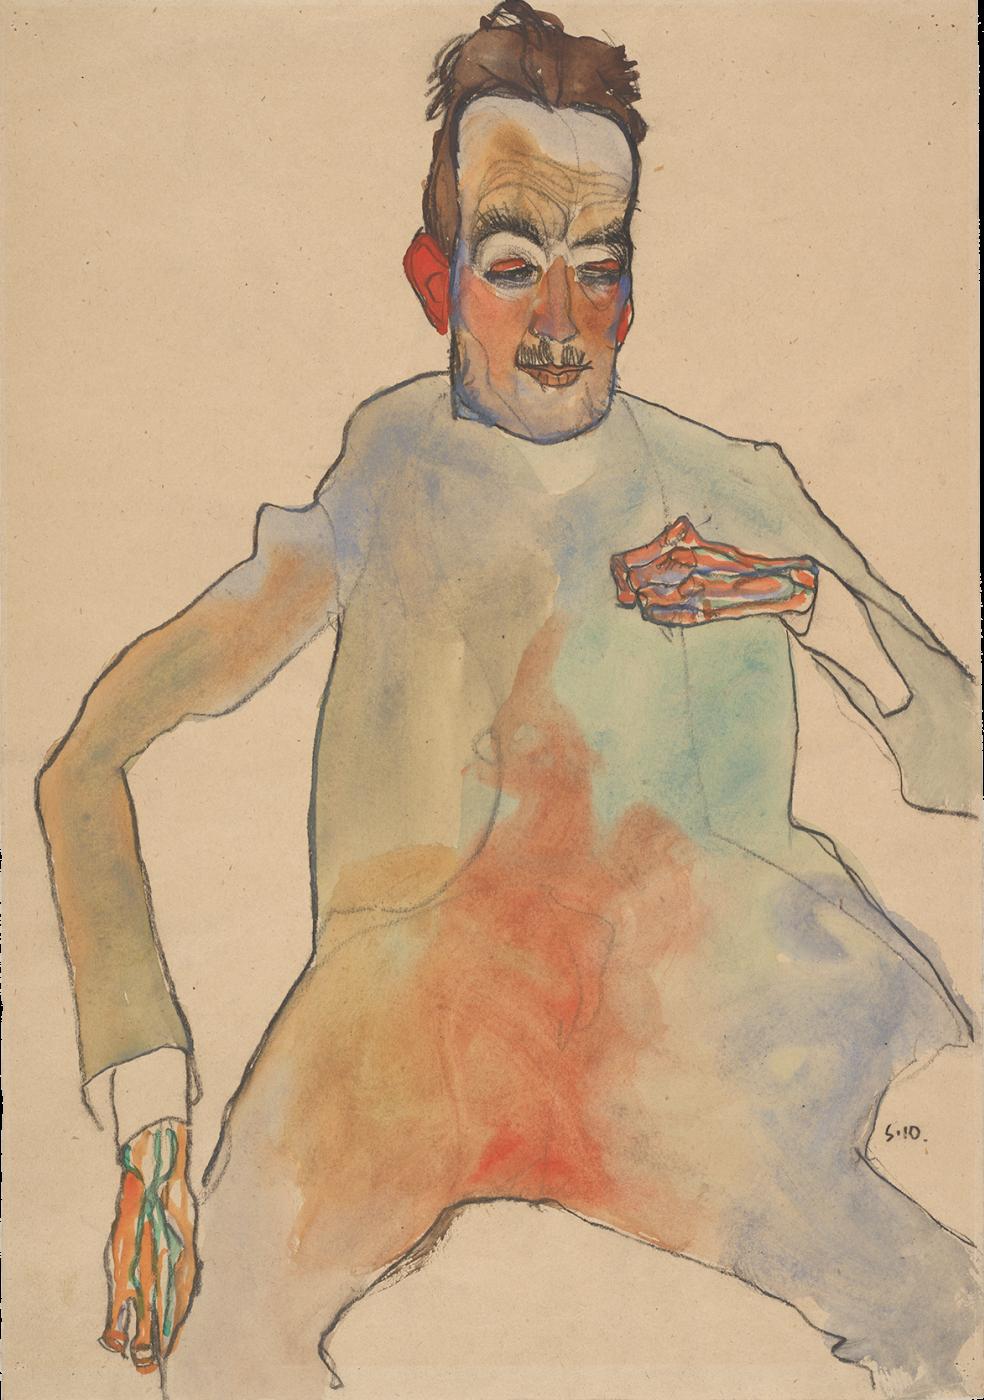 Egon Schiele. The Cellist